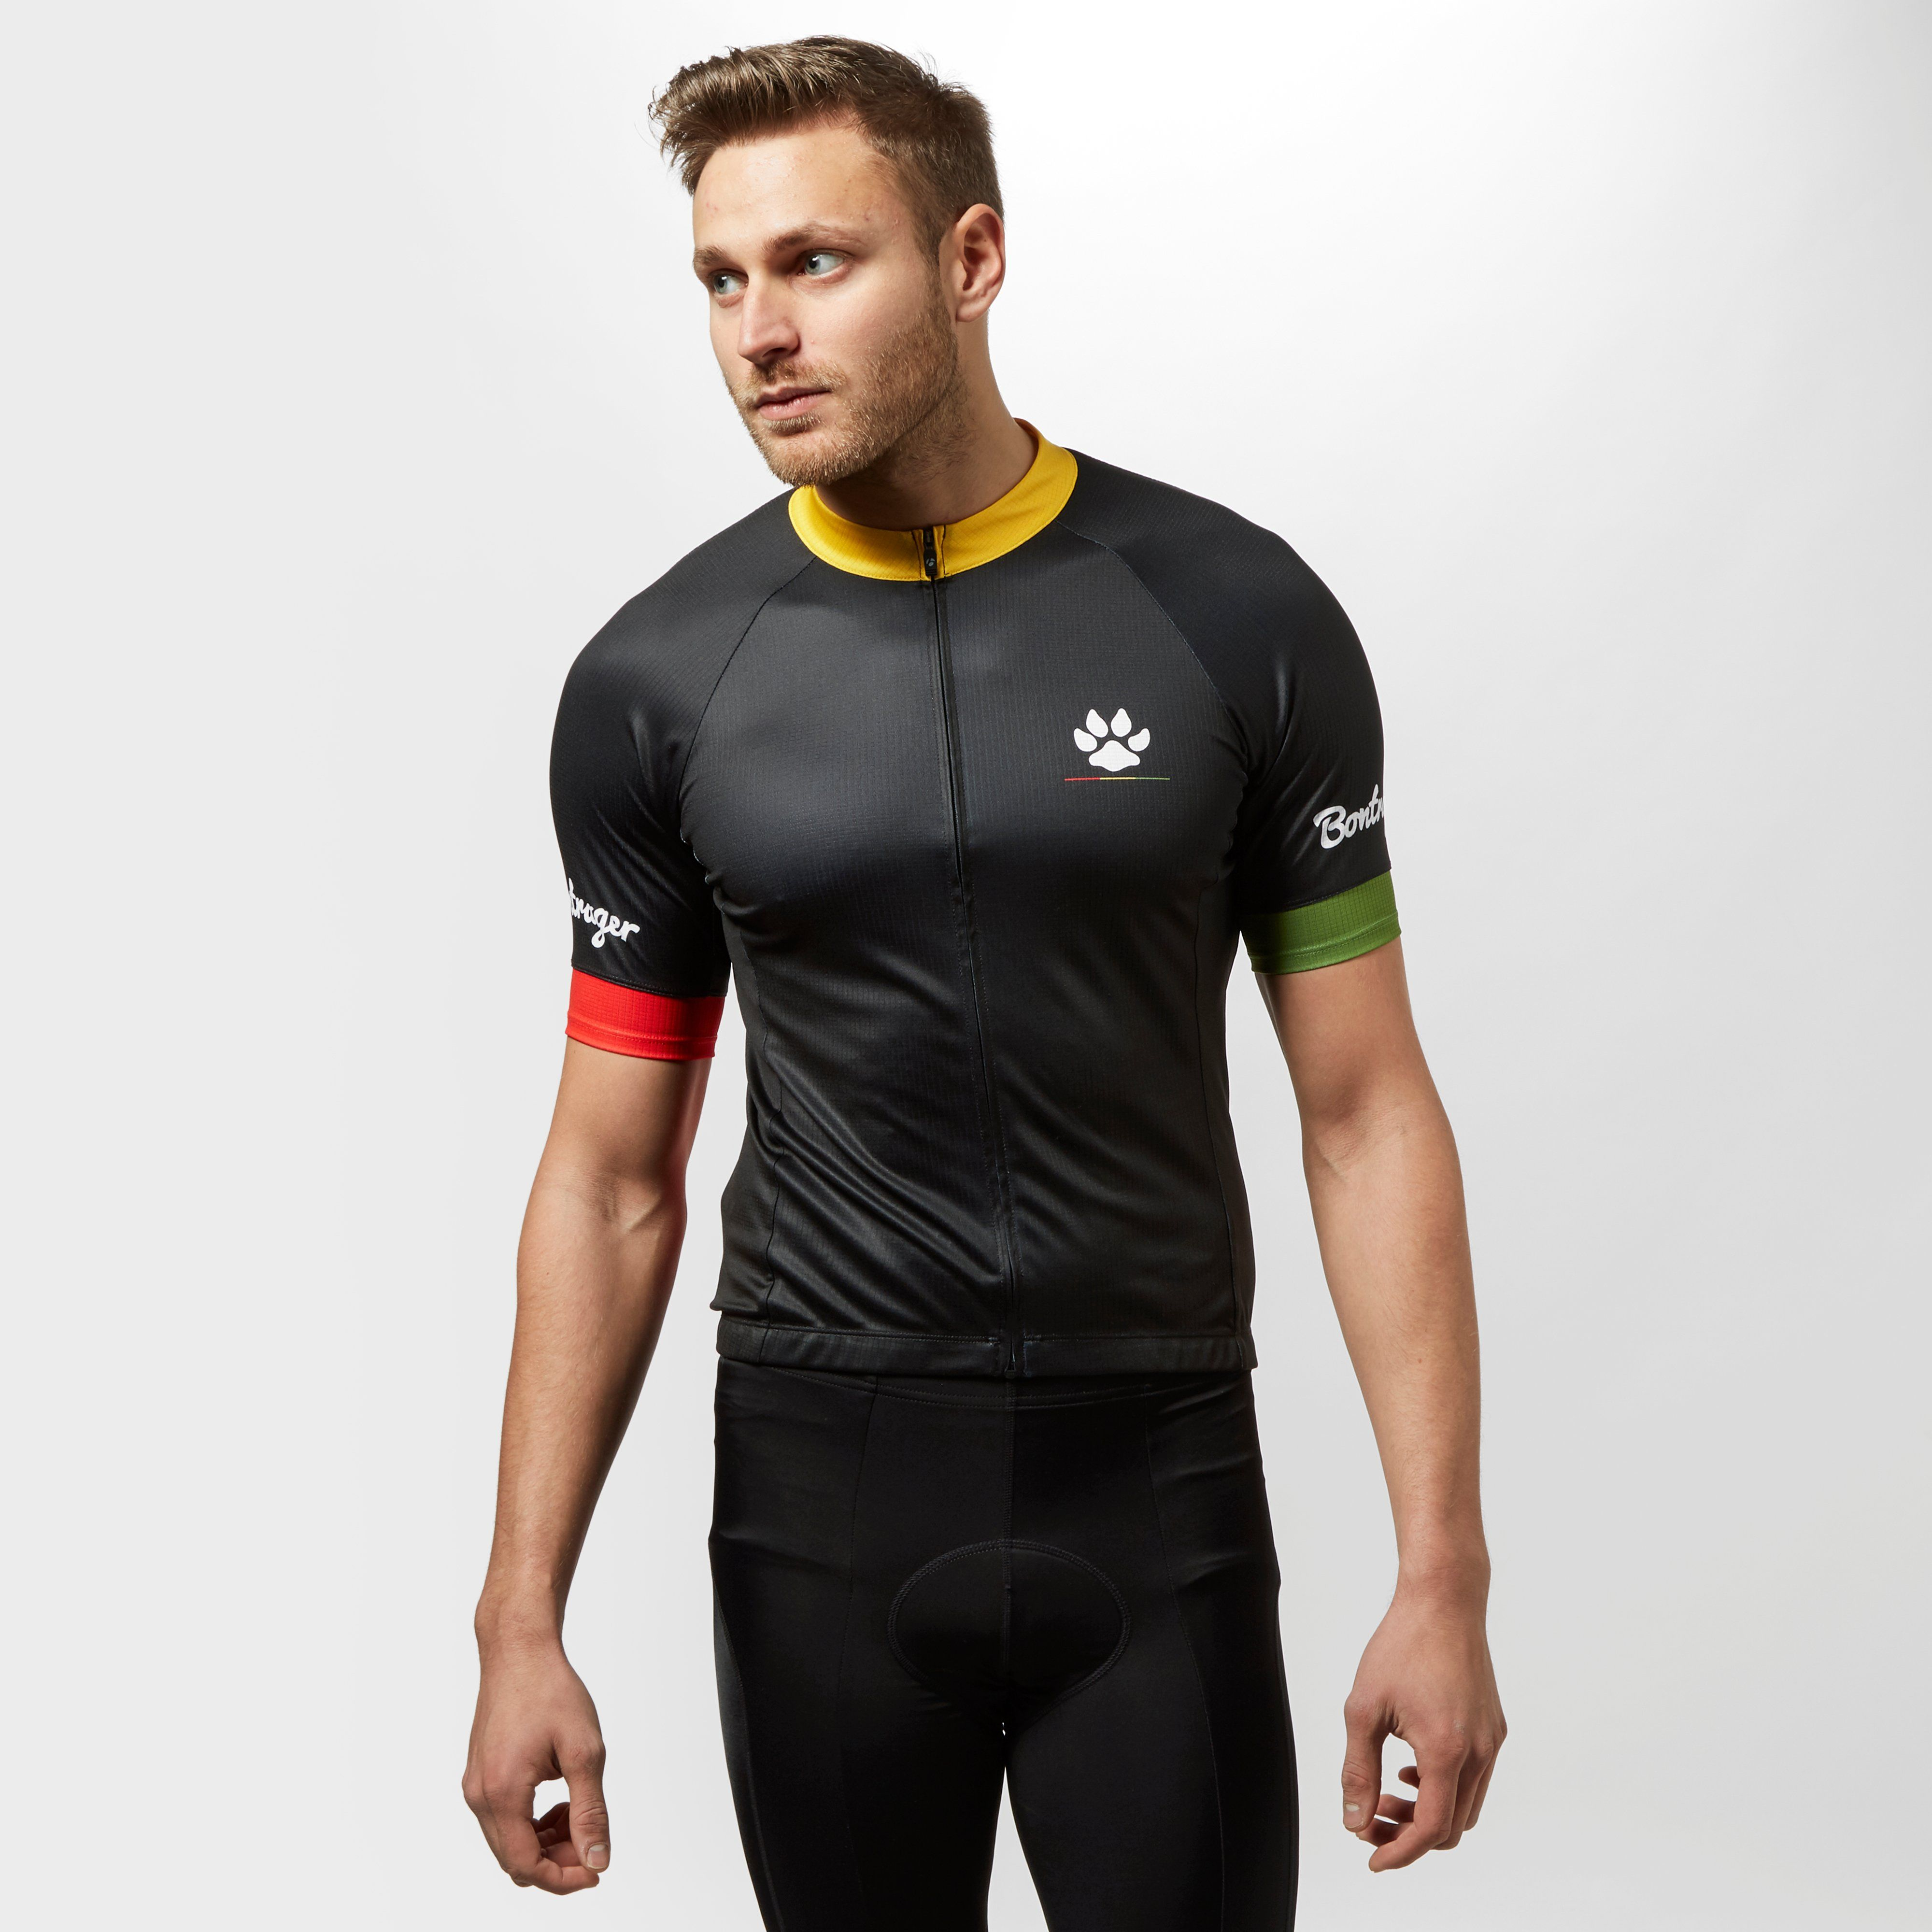 BONTRAGER Men's Specter Cycling Jersey